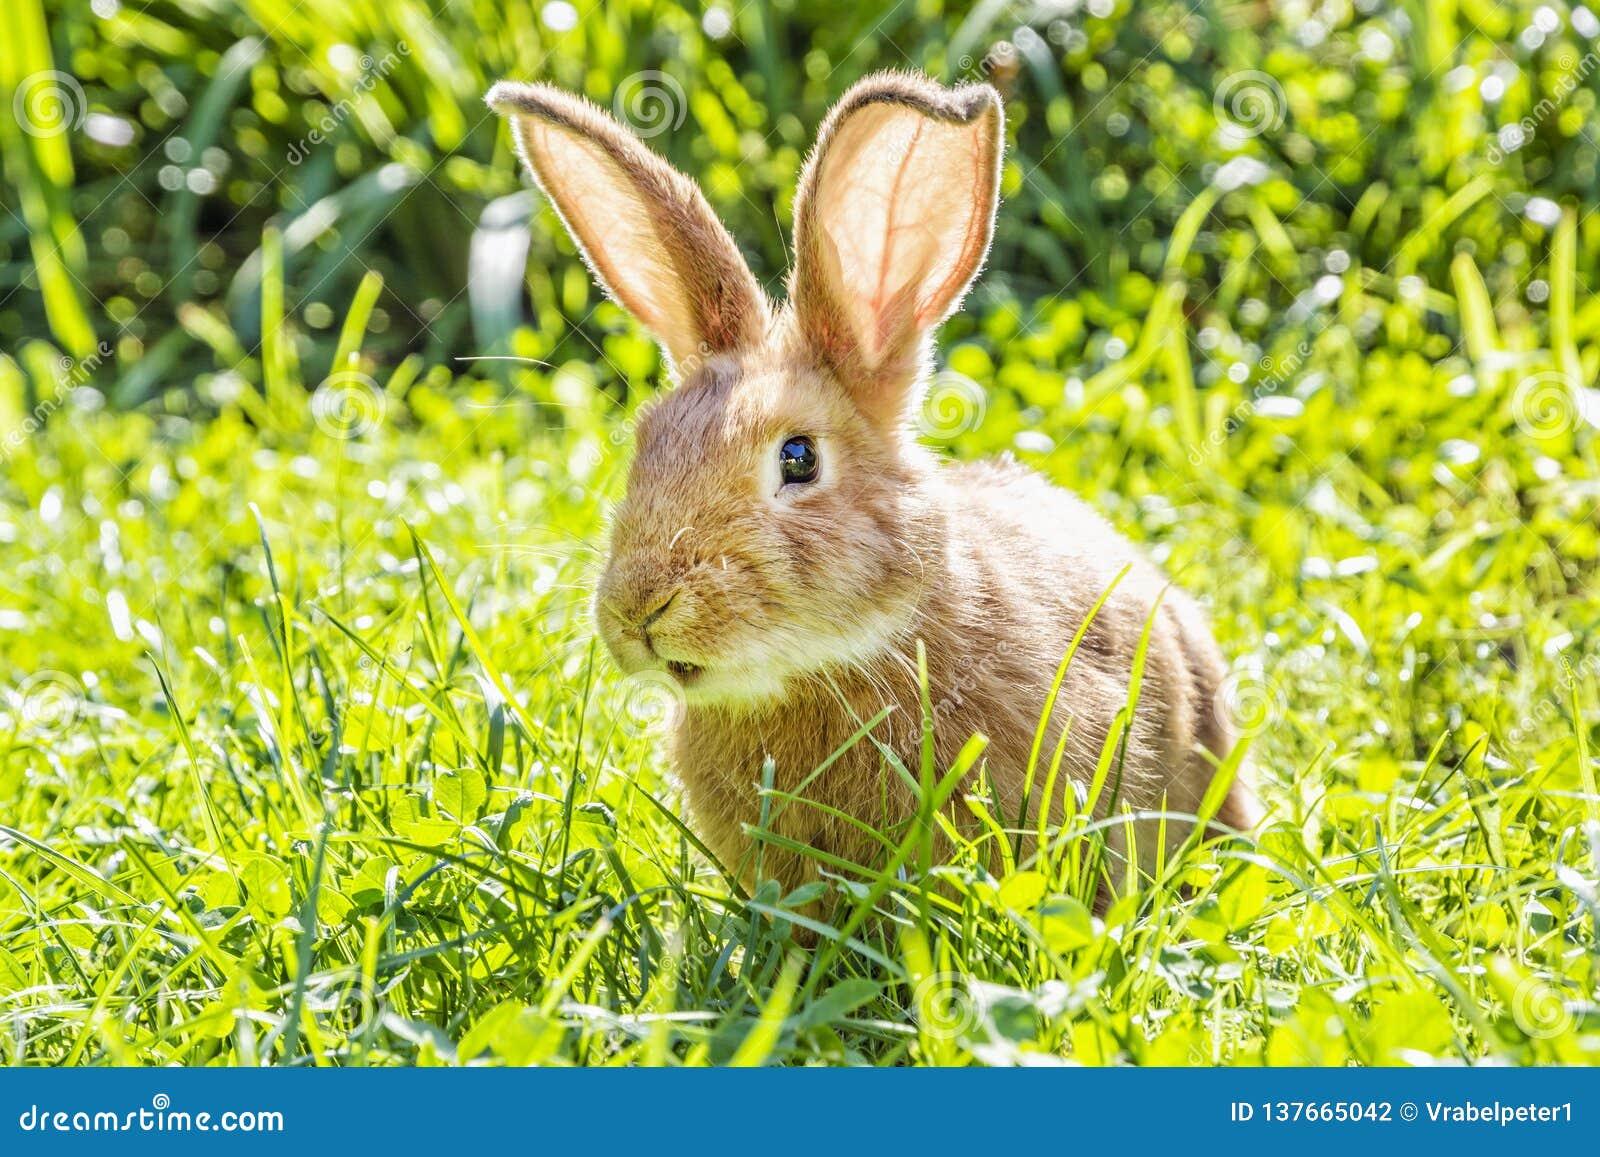 Peu lapin dans l herbe verte, temps de Pâques